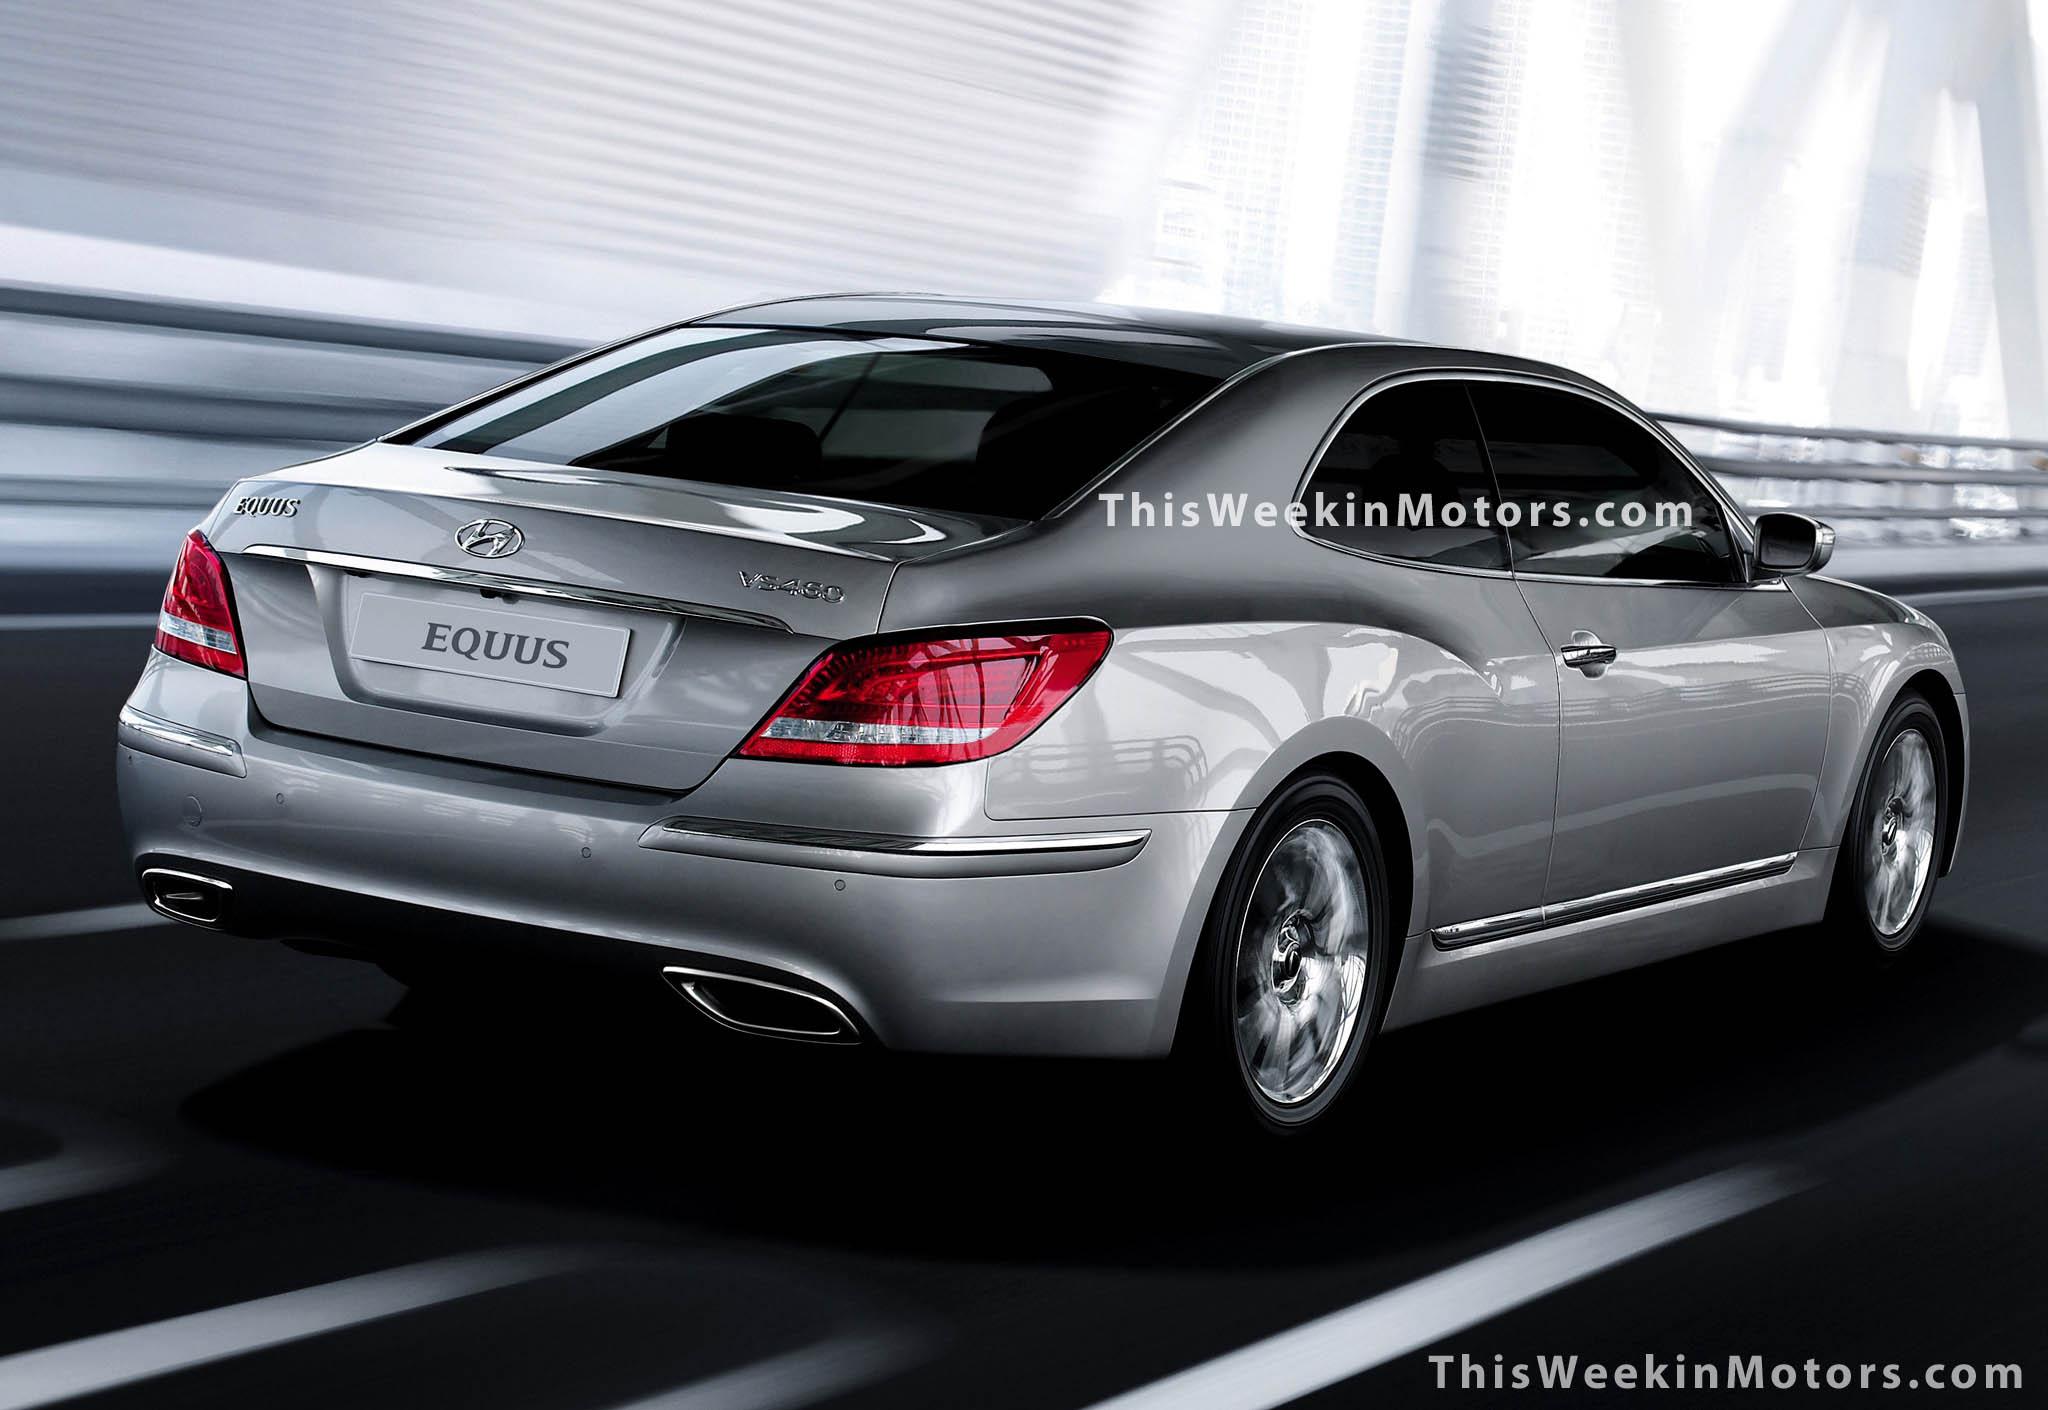 Related to 2010 - 2016 Hyundai Genesis Coupe Accessories - Hyundai